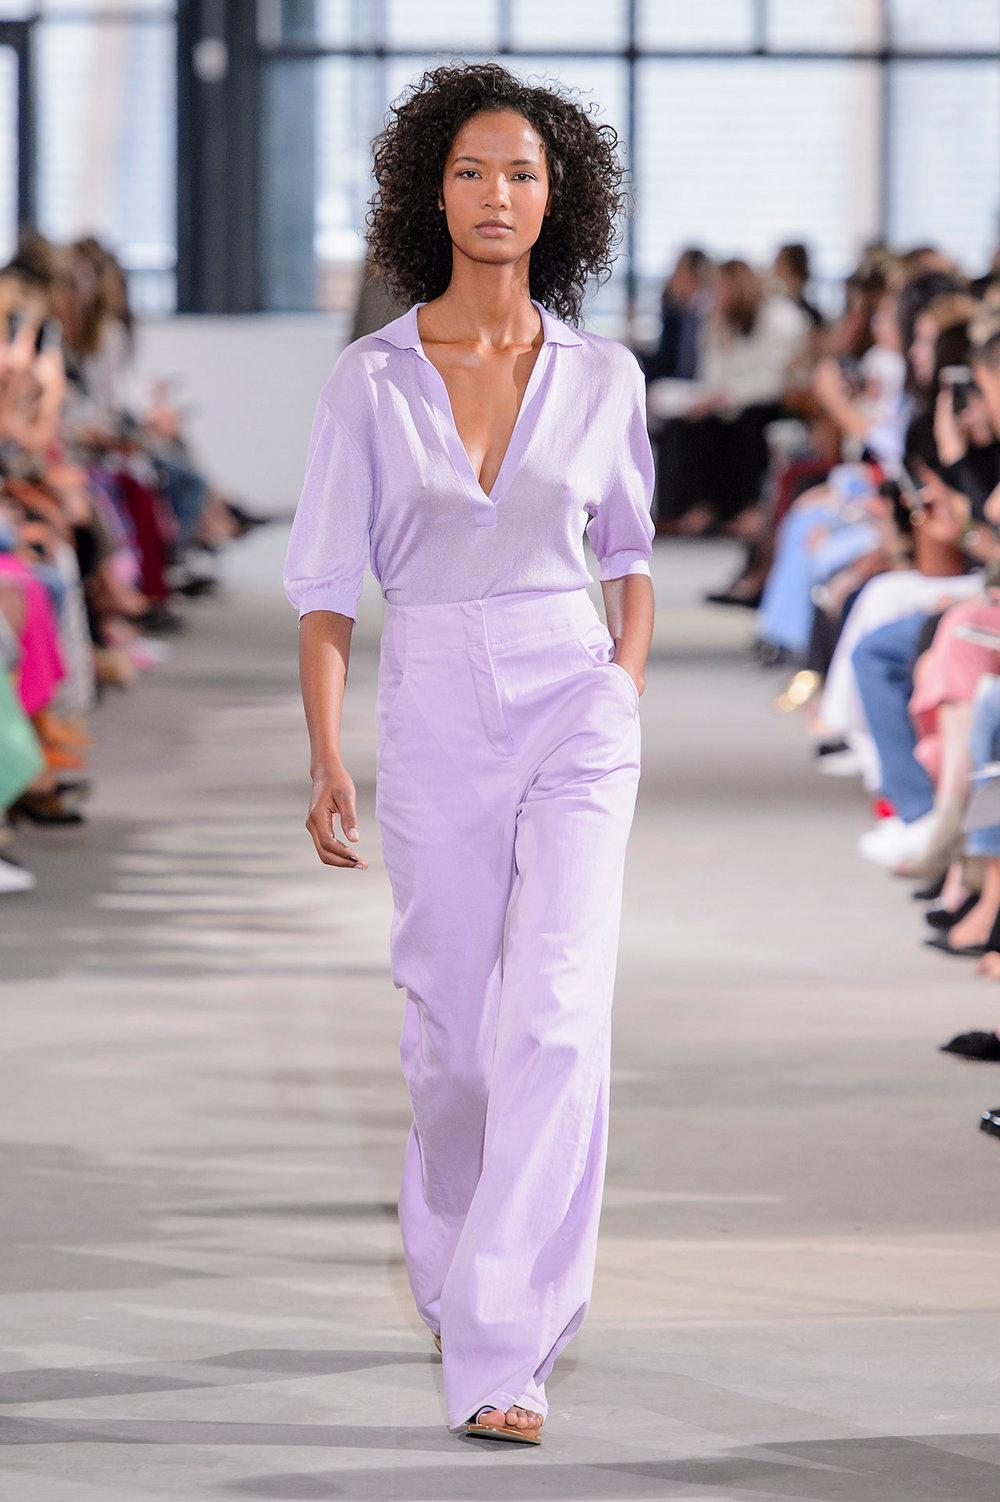 Tibi-Lavender-Outfit-Ideas.jpg